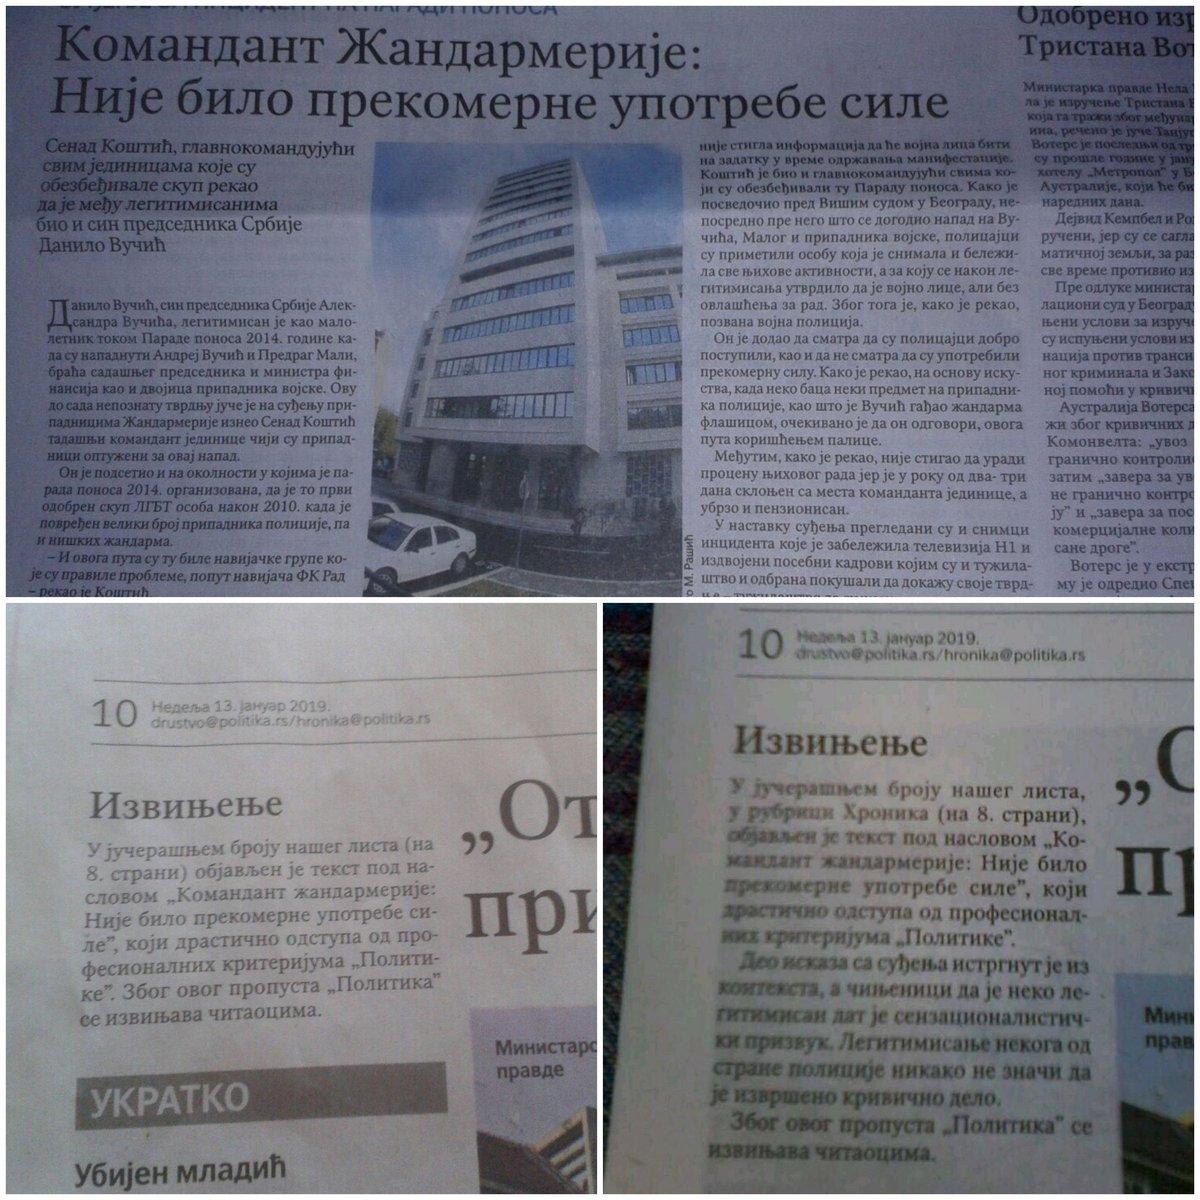 Kada kažem novine... - Page 5 Dw0asLCXgAI6sij